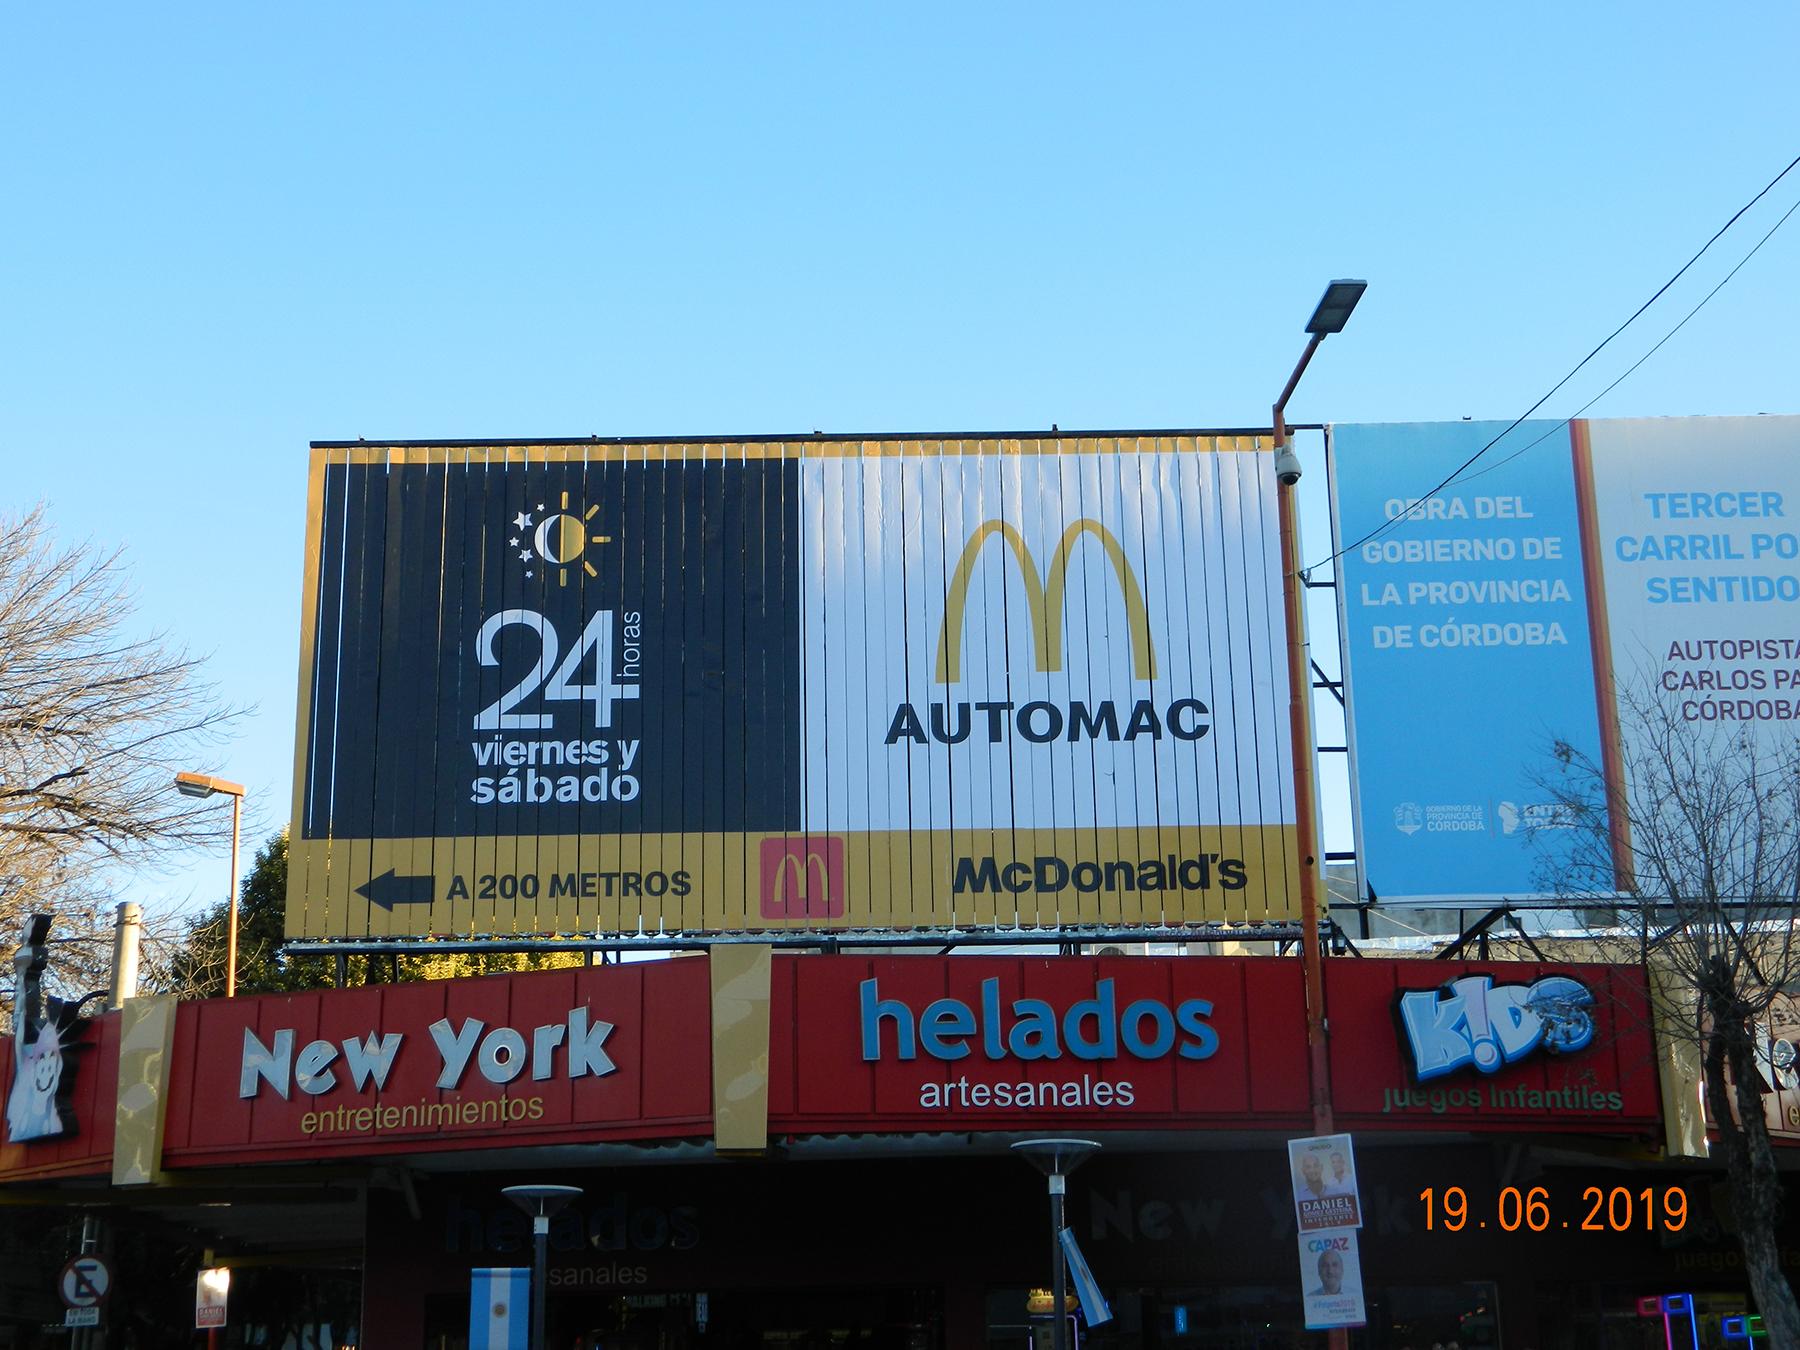 mcdonalds-cordoba-carlos-paz-triedro-ayi-ooh-publicidad-2.jpg